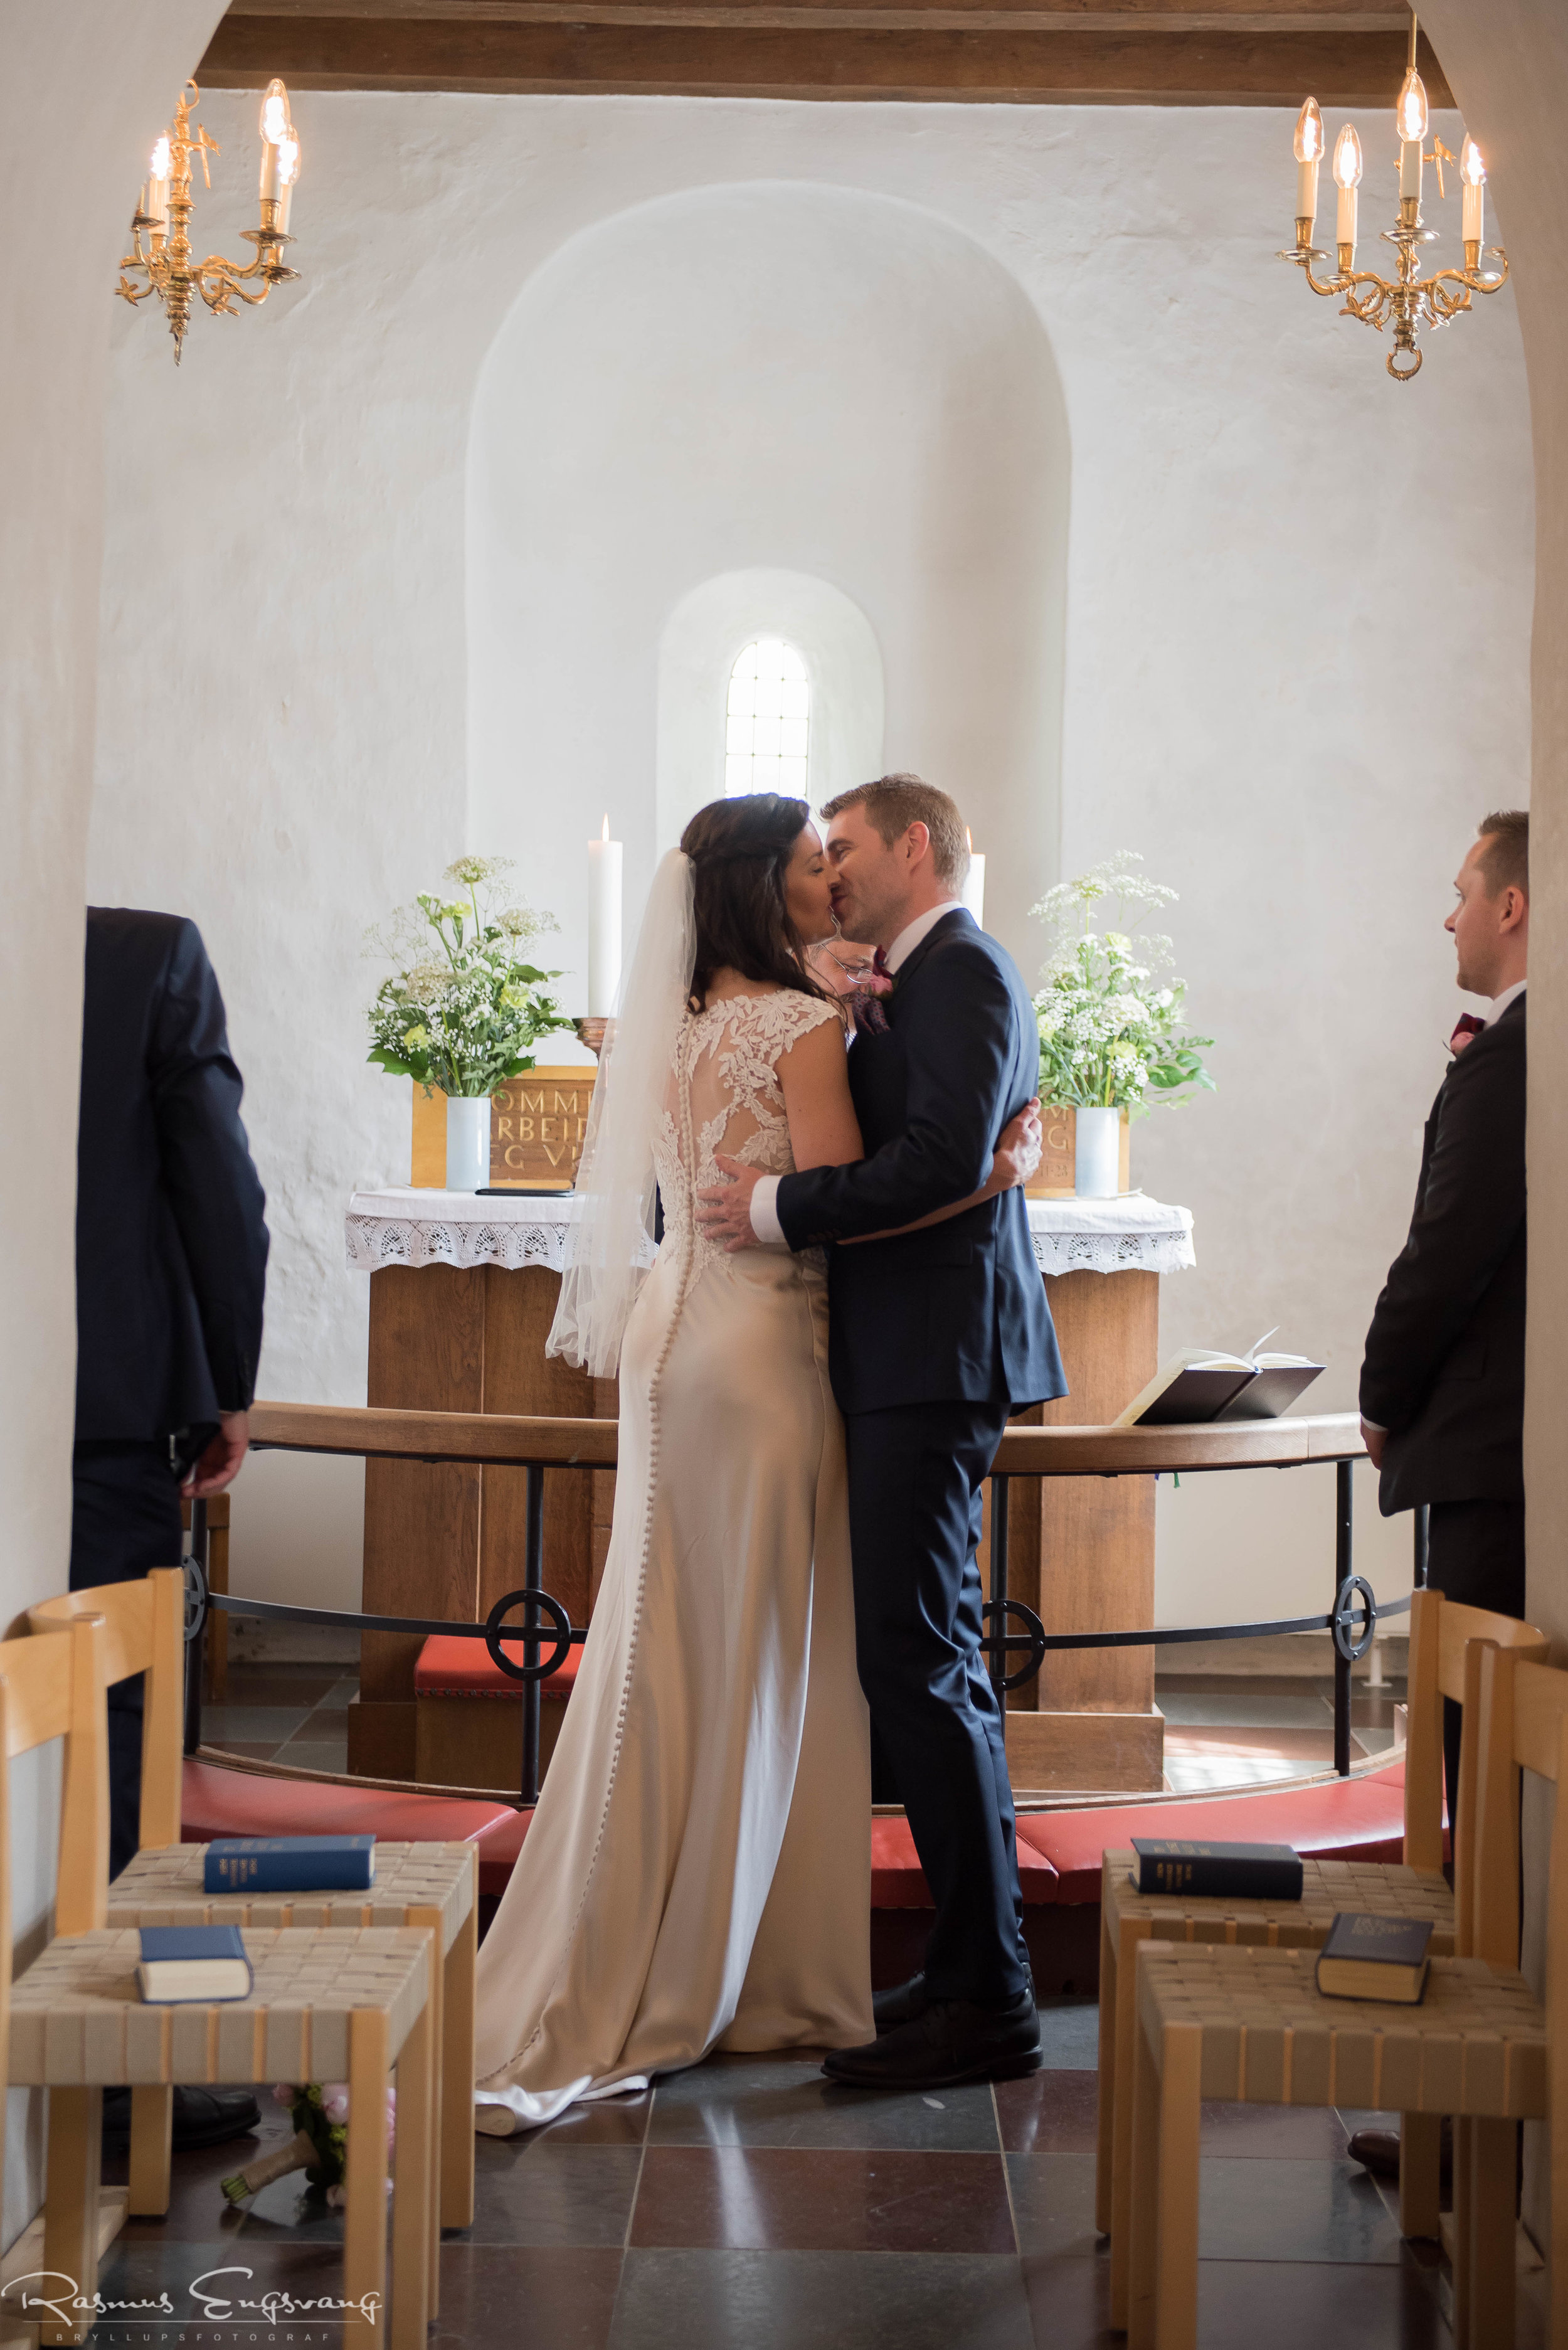 Måløv-Kirke-Bryllupsfotograf-København_Sjælland-107.jpg